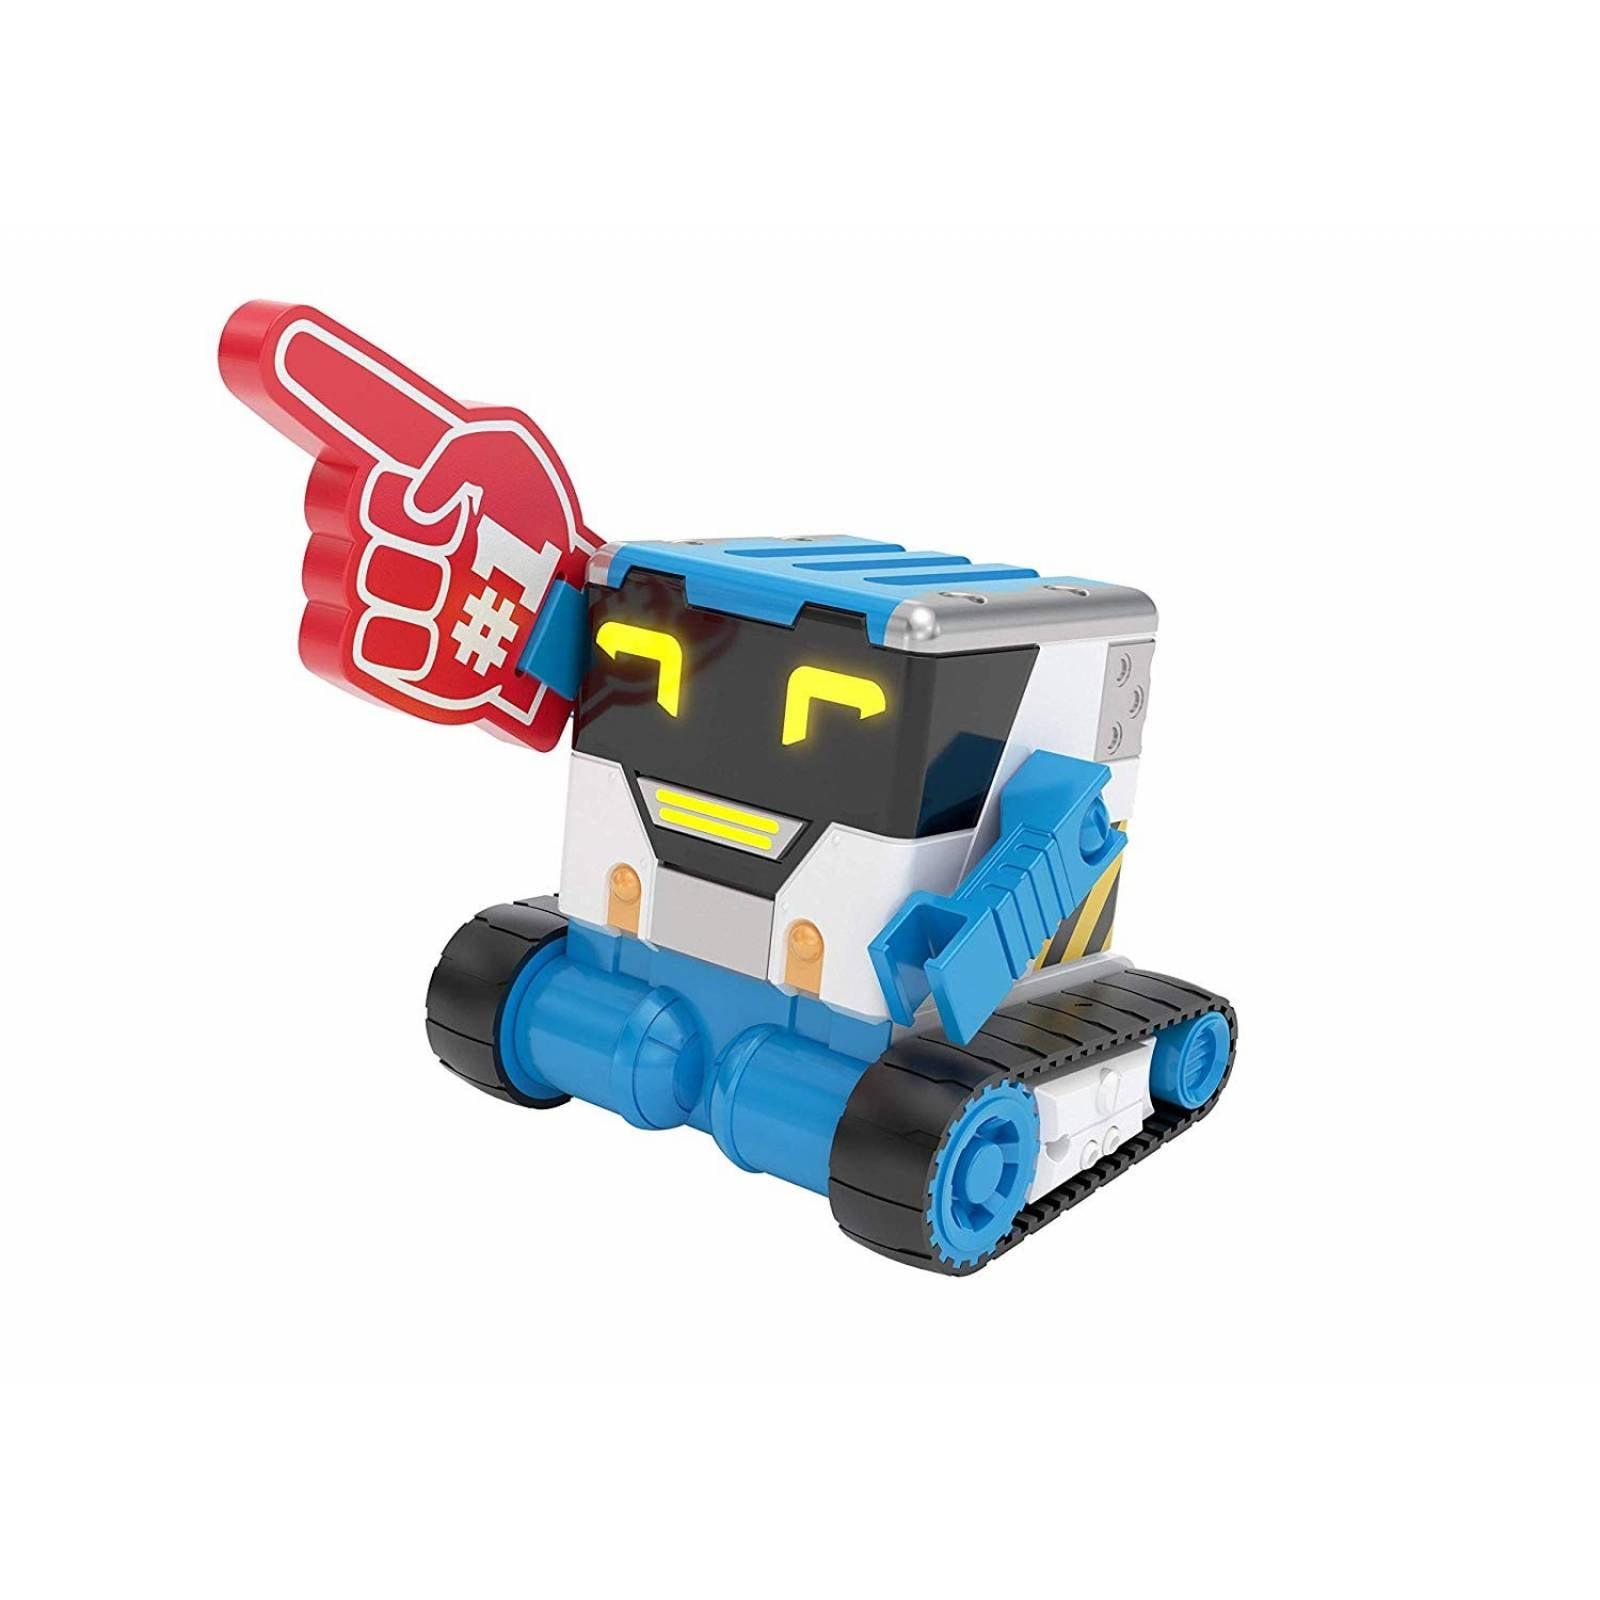 Remoto Really Control Juguete Rad Robots Robot Interactivo PkiwOXZTlu